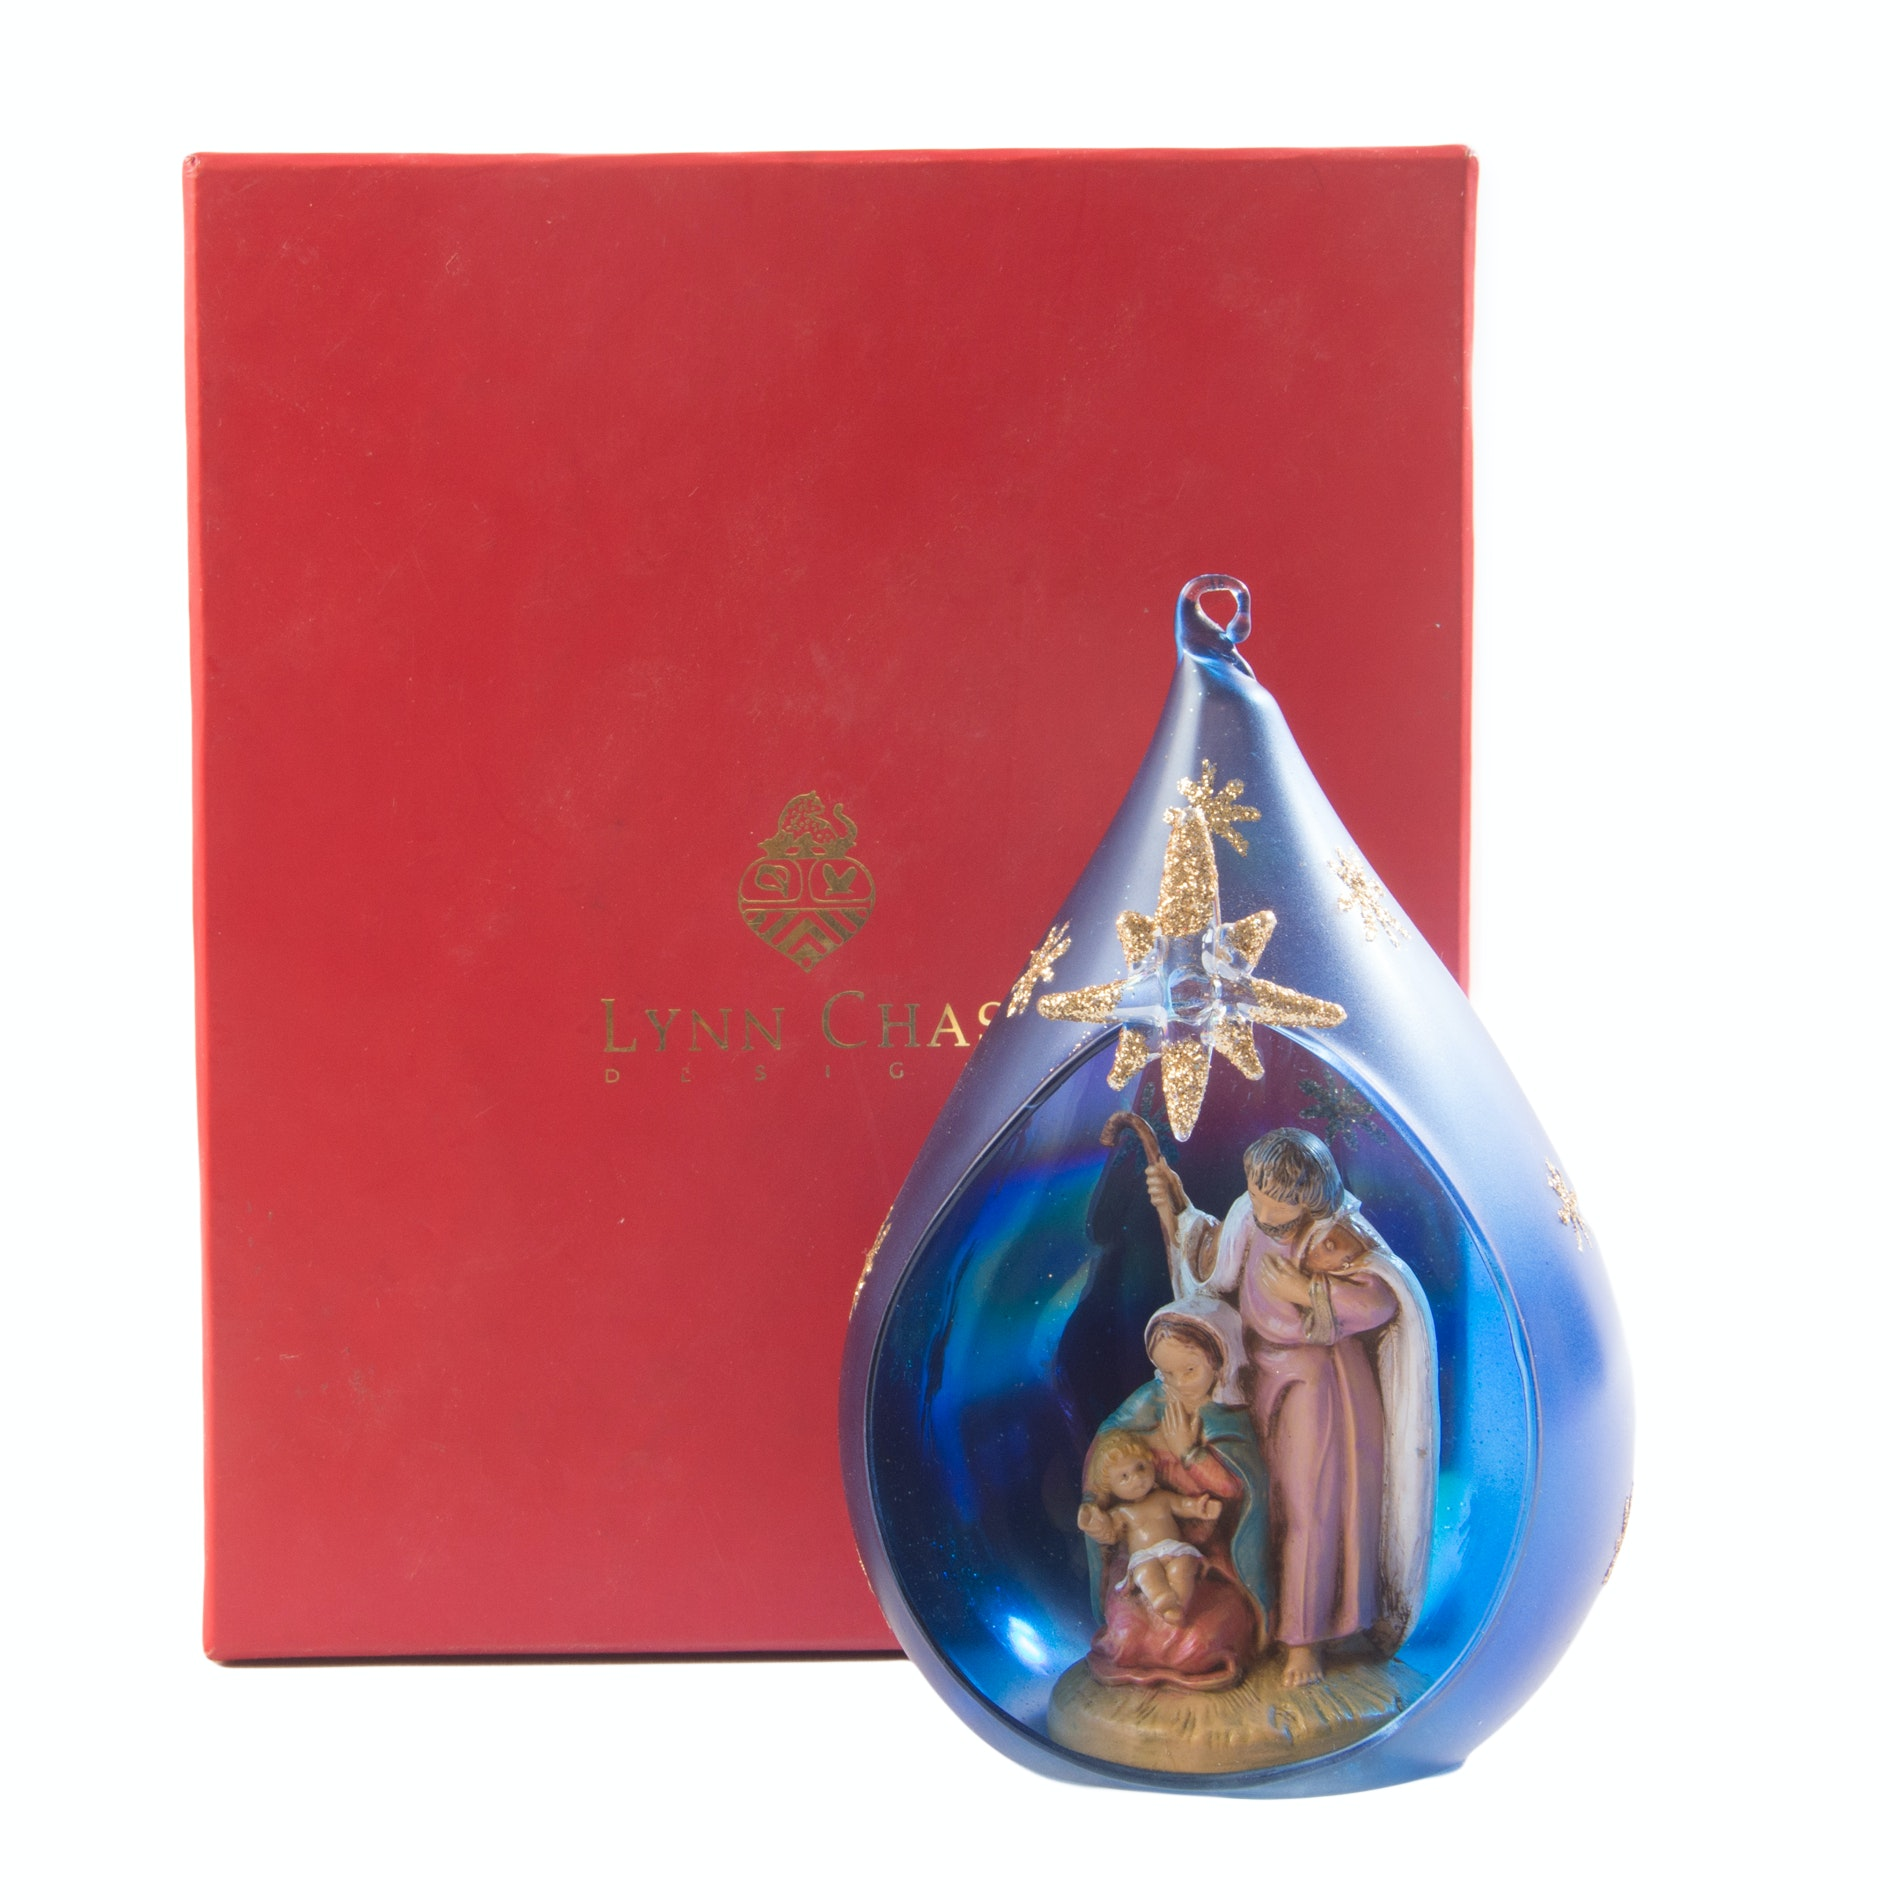 Lynn Chase Nativity Ornament